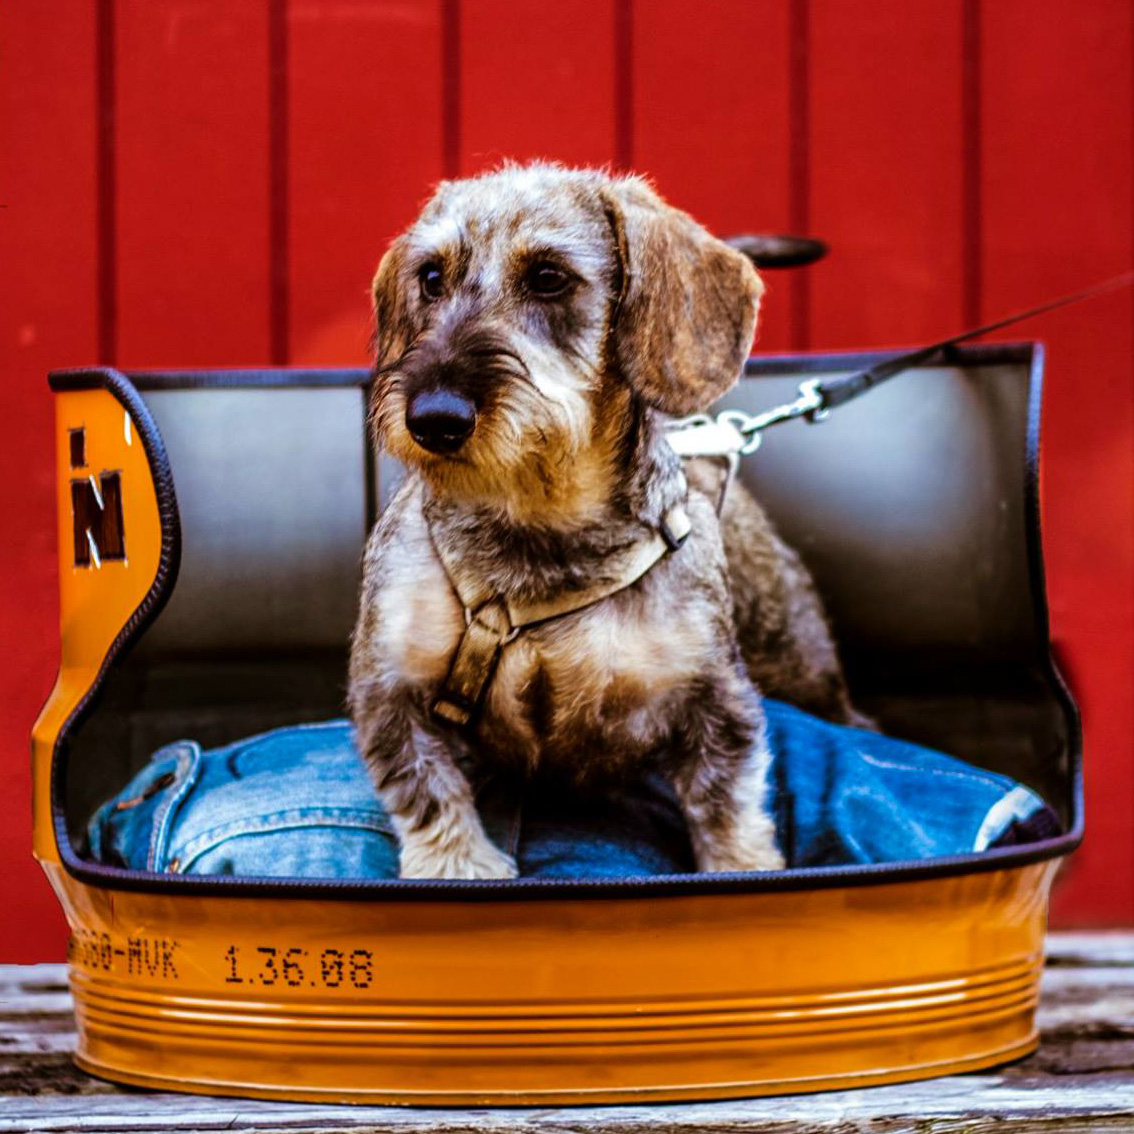 Upcycled Stoere Industriële Hondenmand van Indusigns